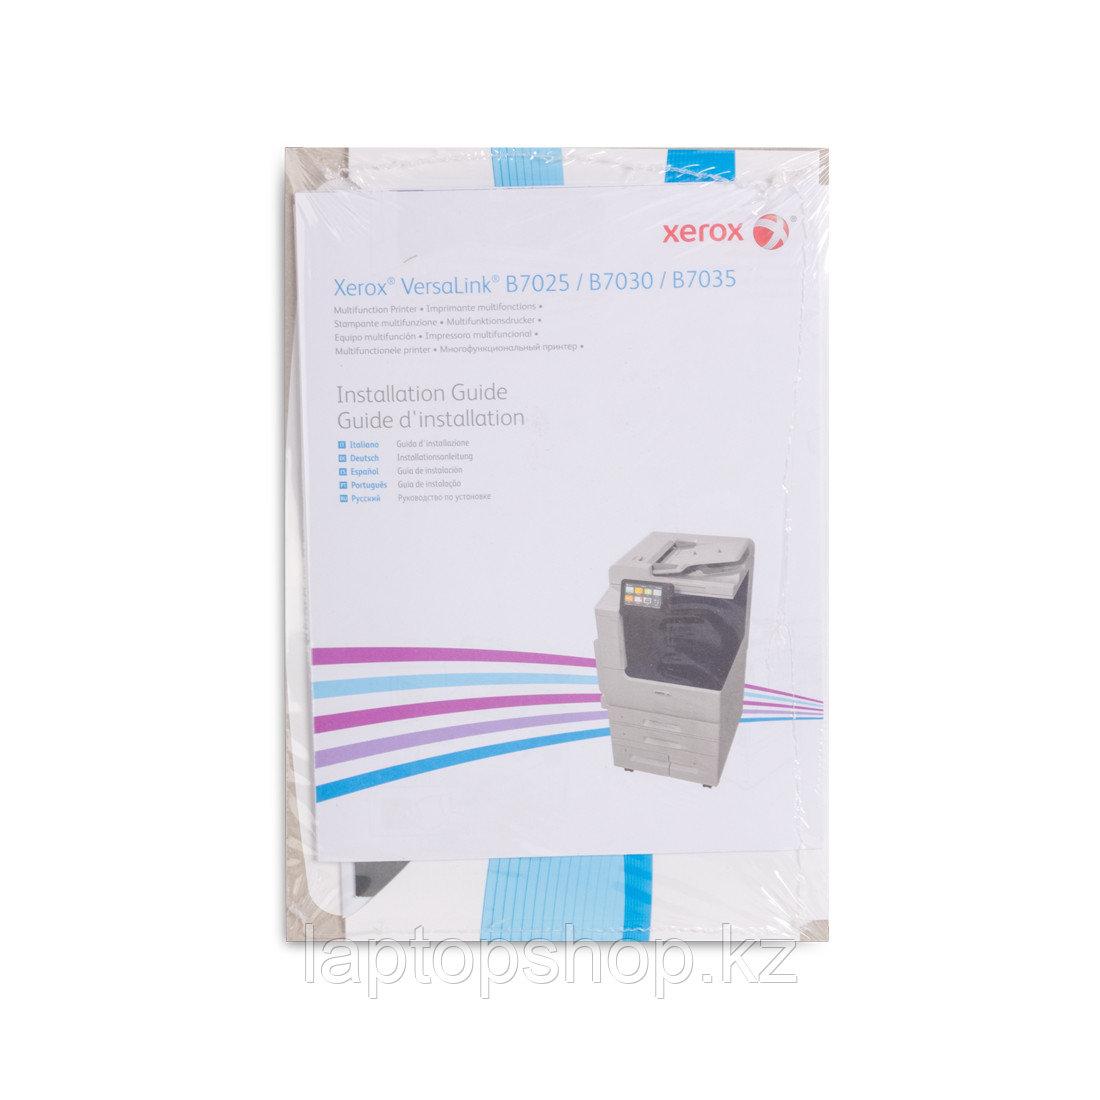 Комплект локализации Xerox VersaLink B7025/30/35 (B7001KD2)